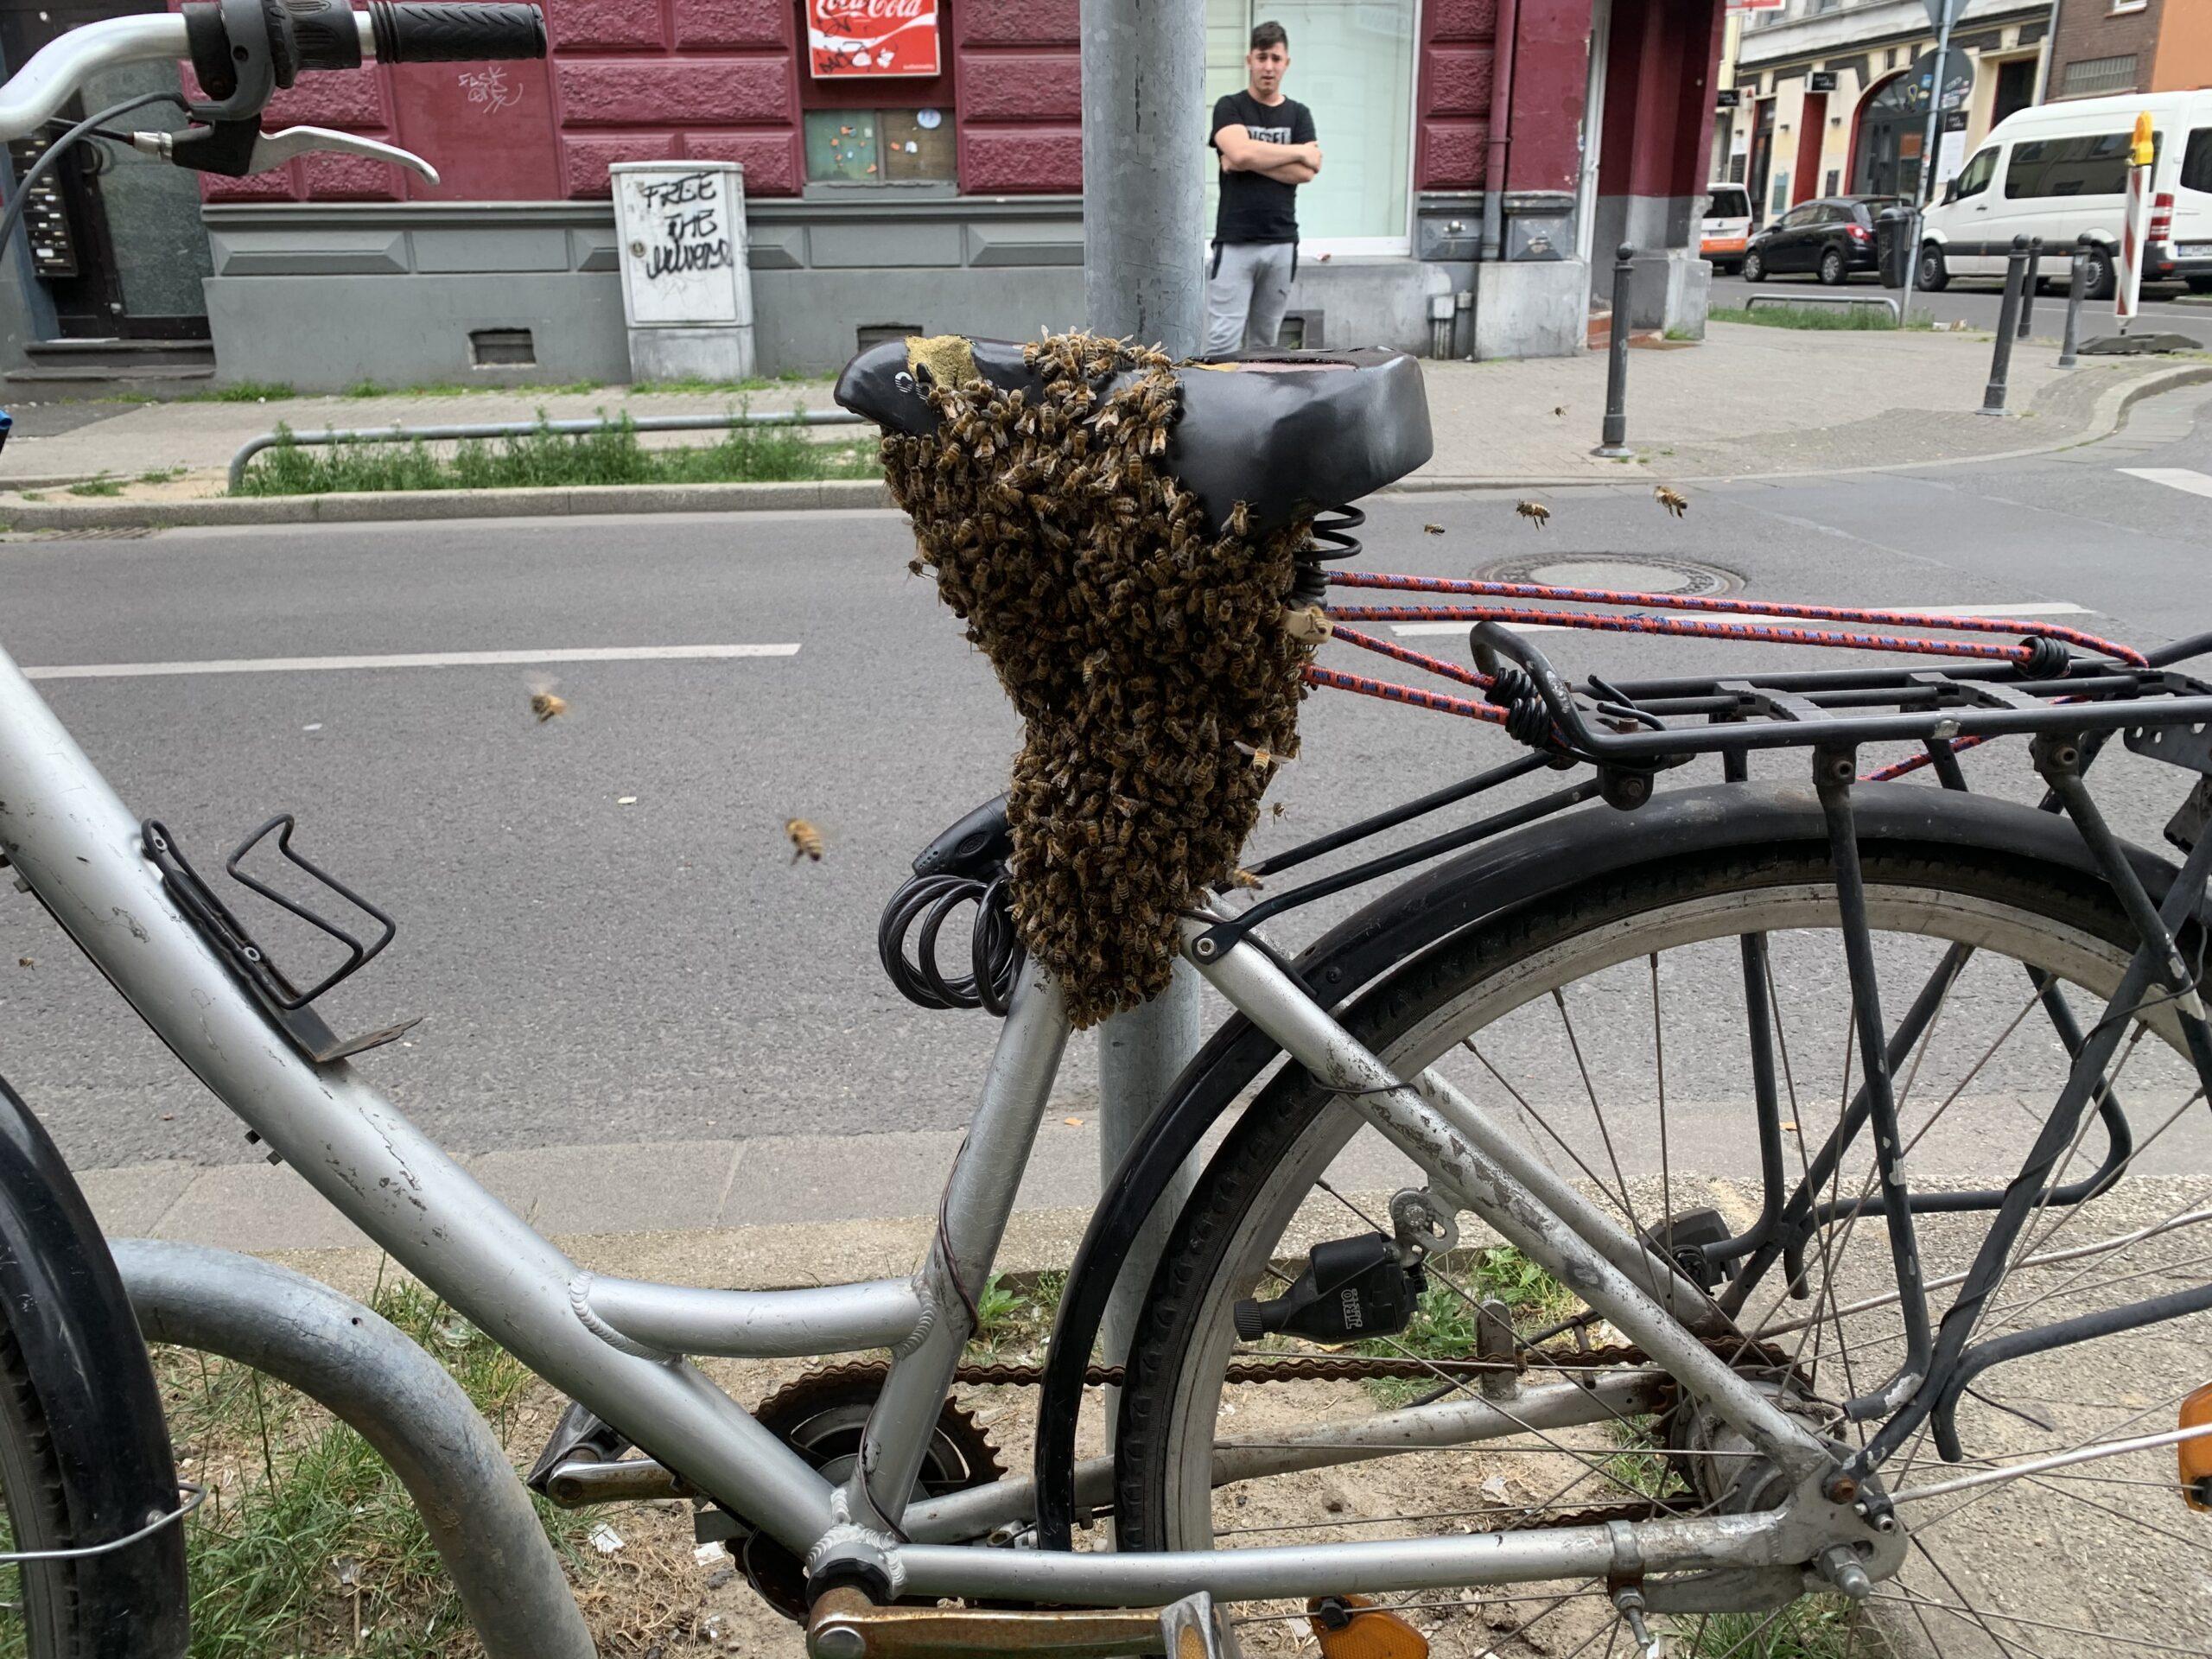 Bienenschwarm in Krefeld Fahrrad